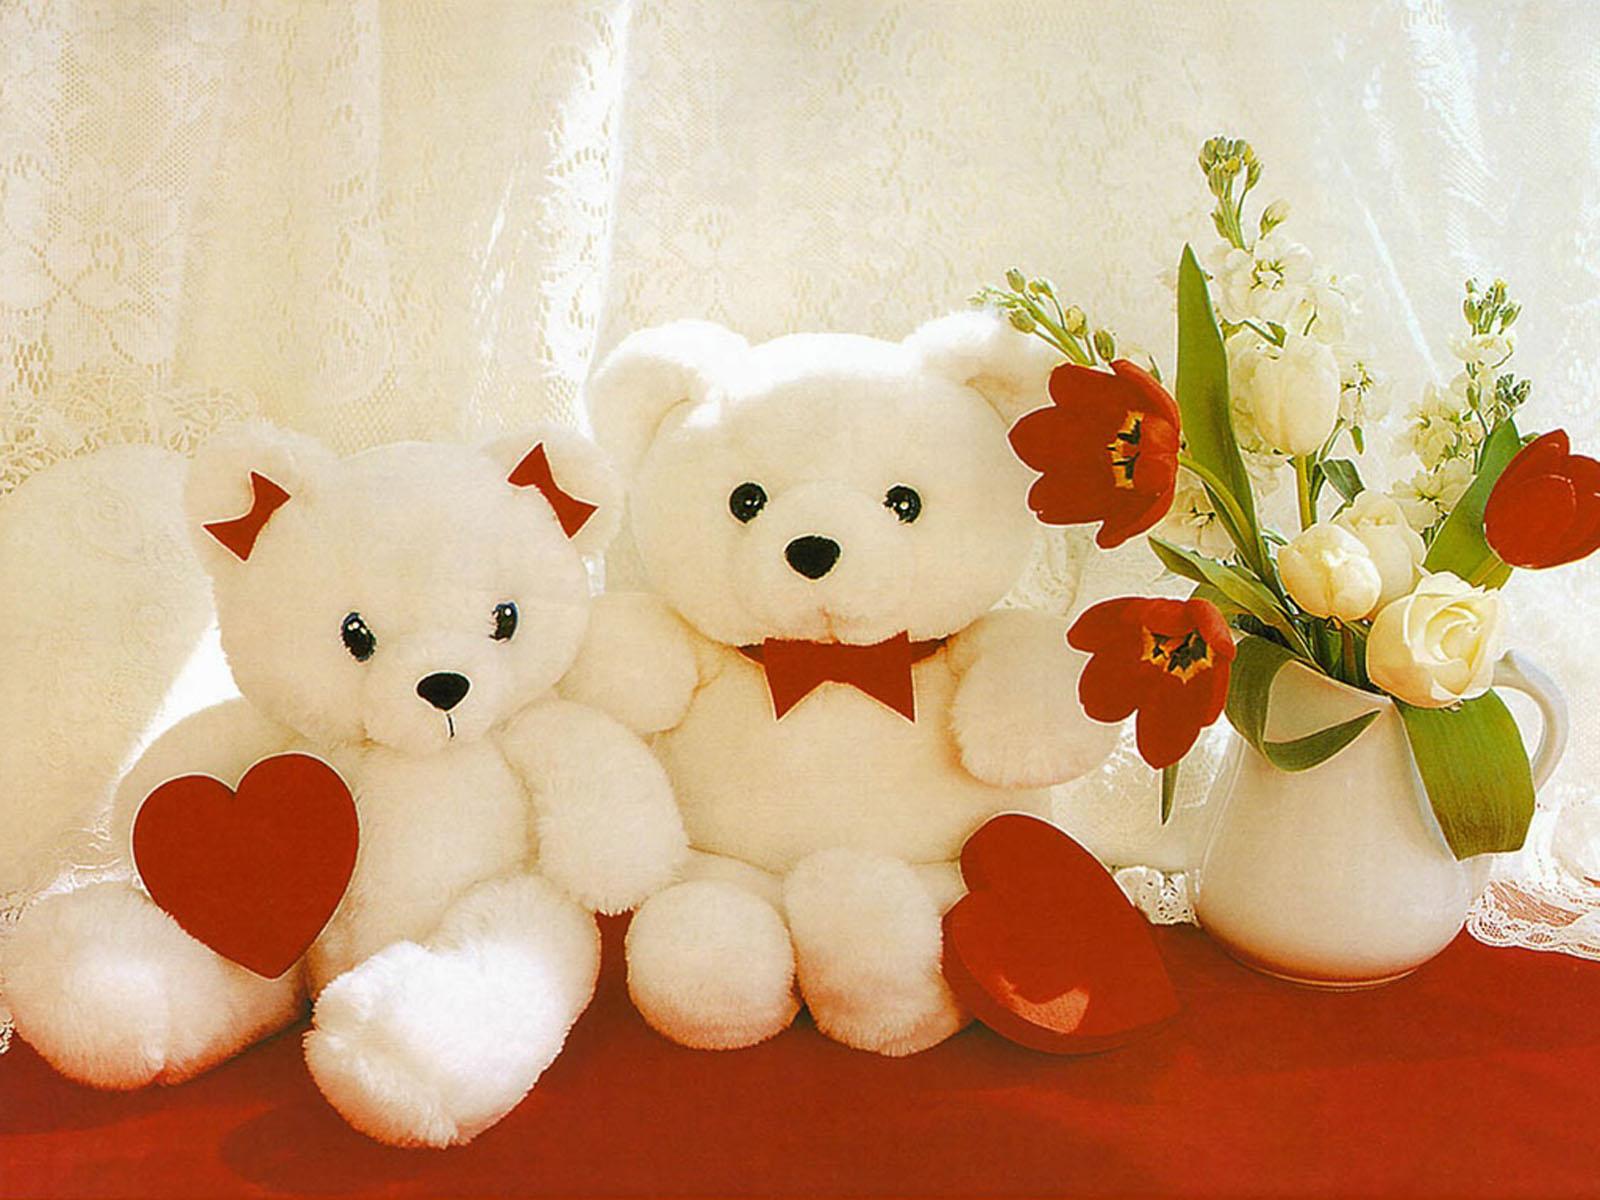 Cute teddy bear images. Have you seen our teddy bears ...